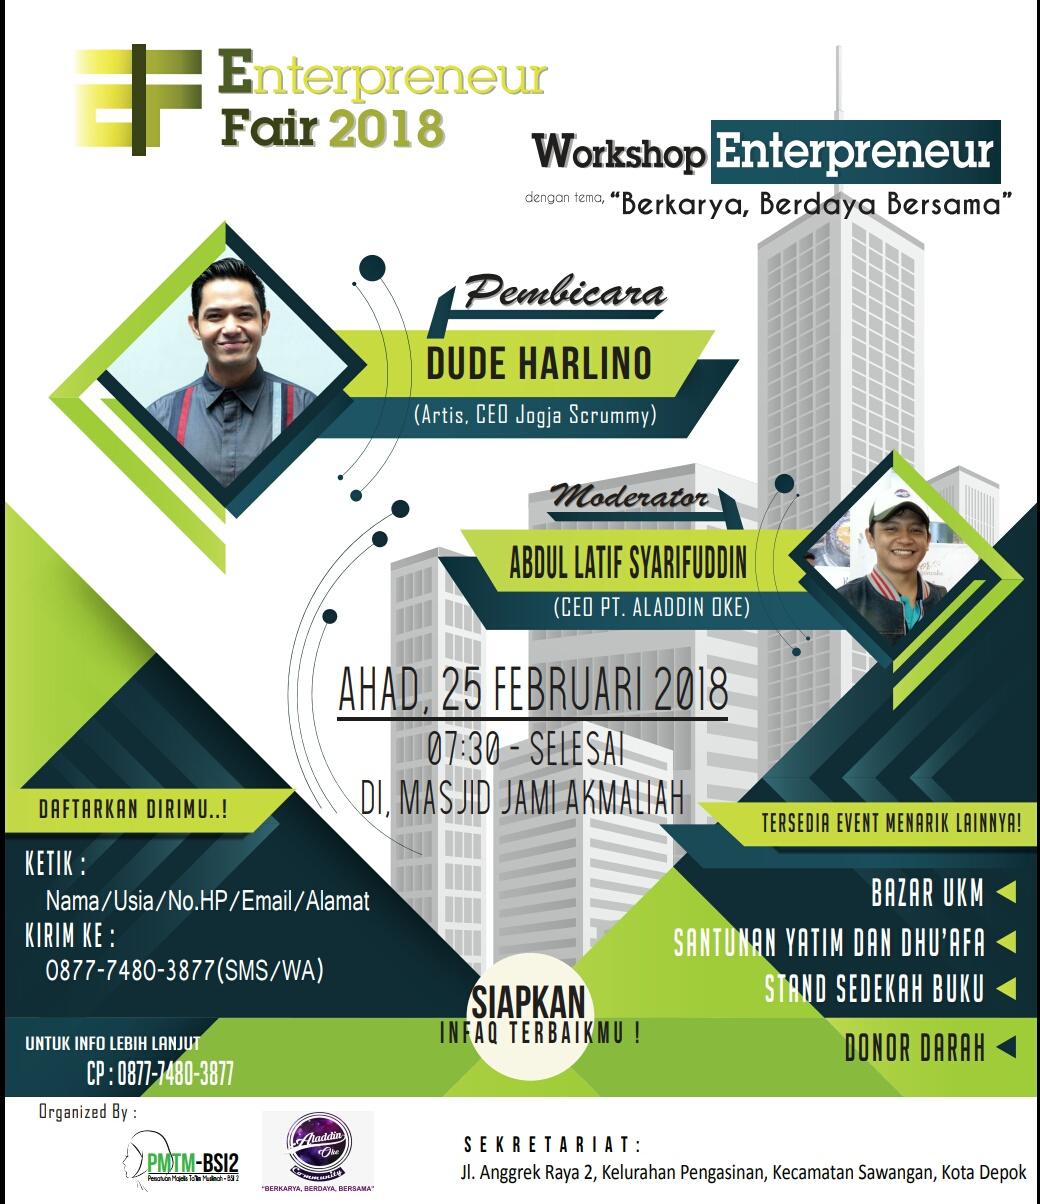 "Yuk, Daftar di Enterpreneur Fair 2018, Work Enterpreneur ""Berkarya, Berdaya Bersama"""